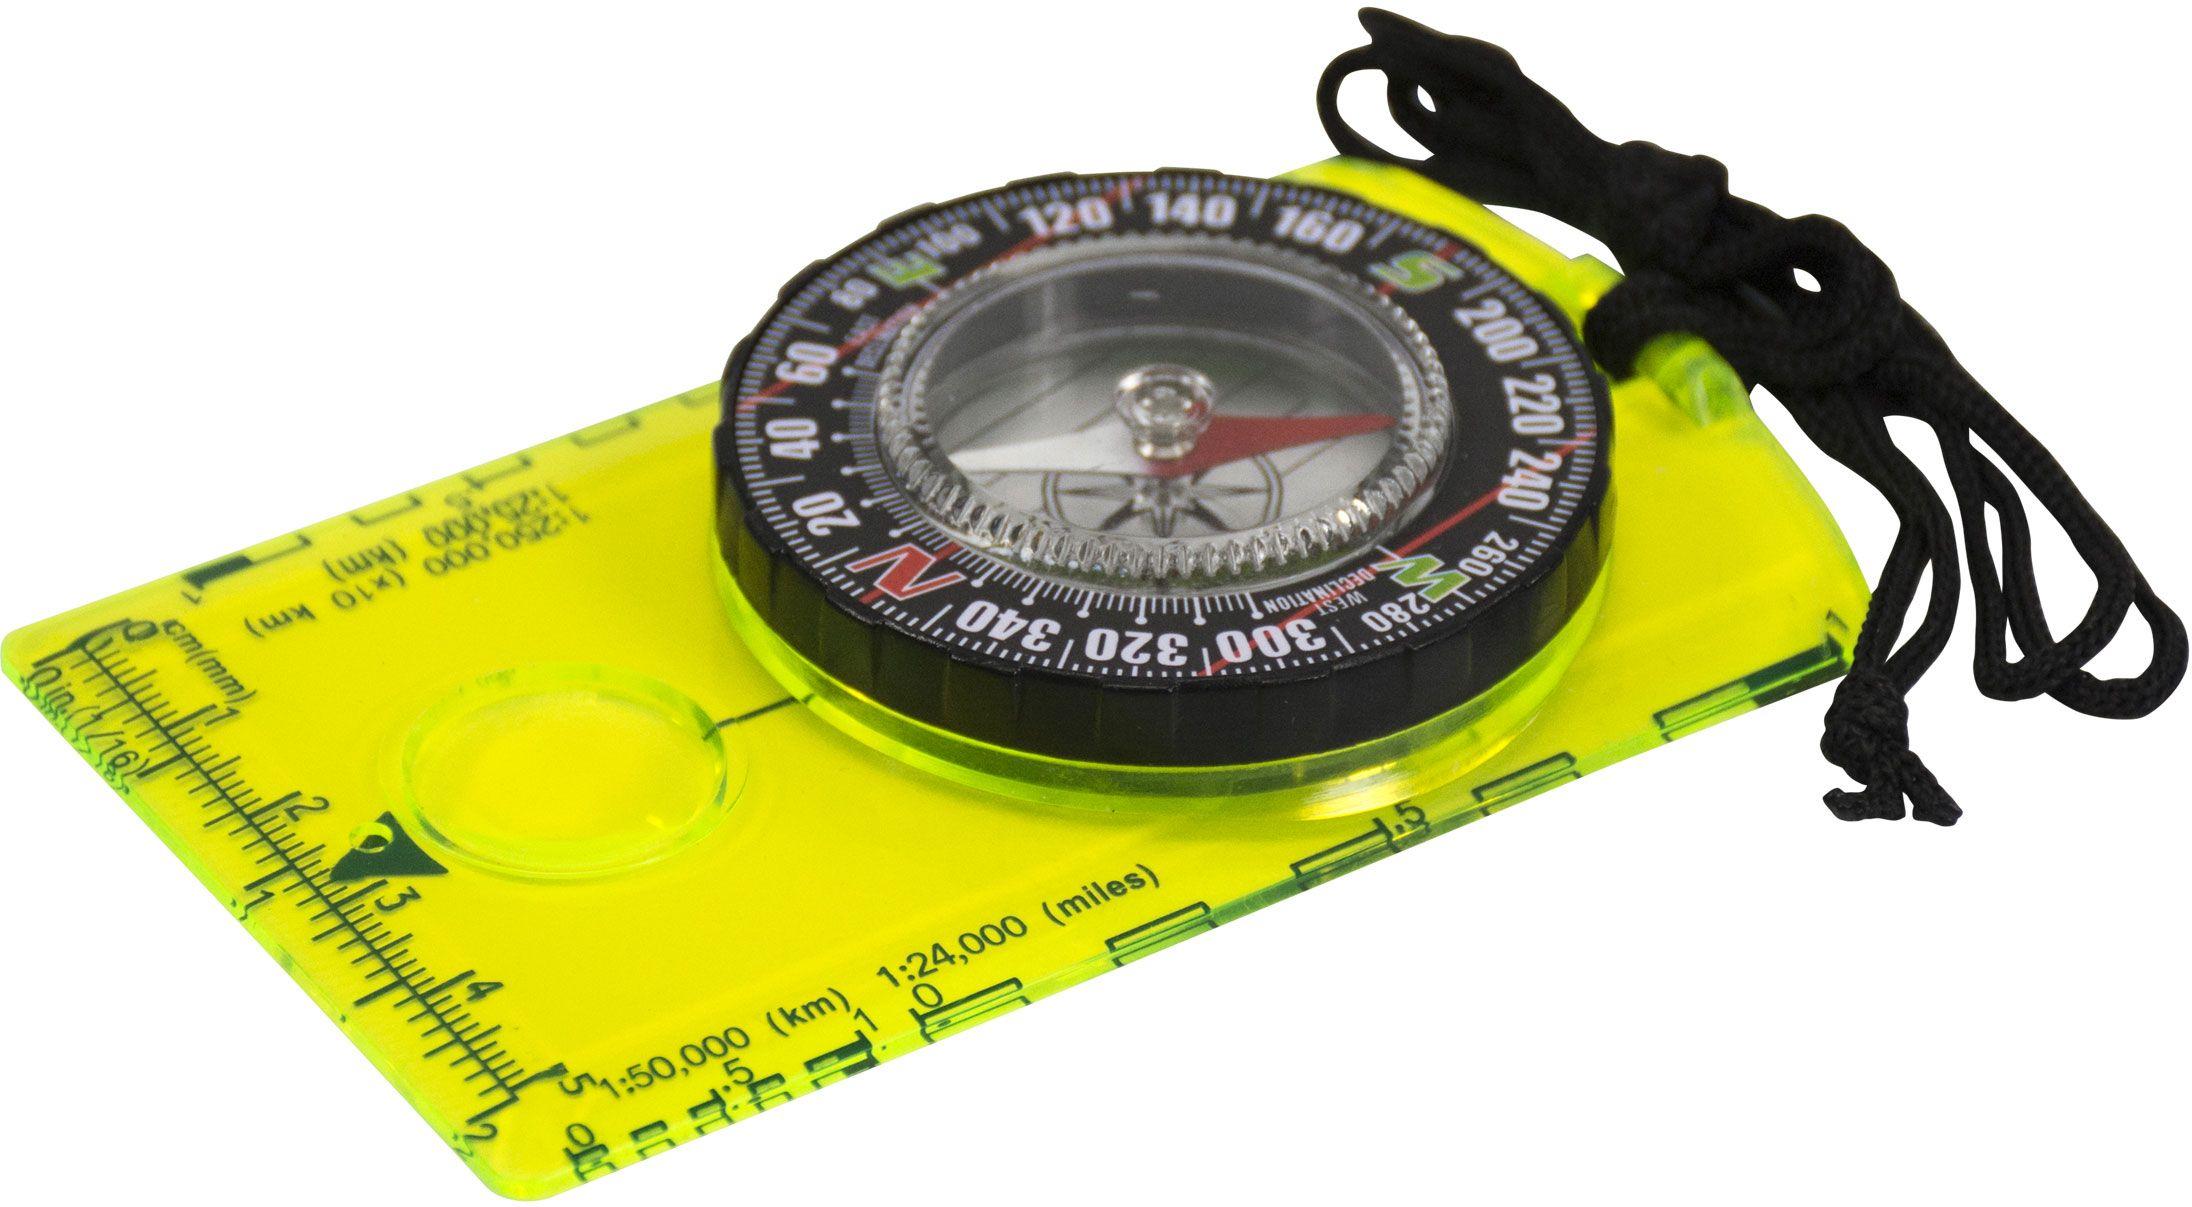 UST Ultimate Survival Hi Vis Deluxe Map Compass